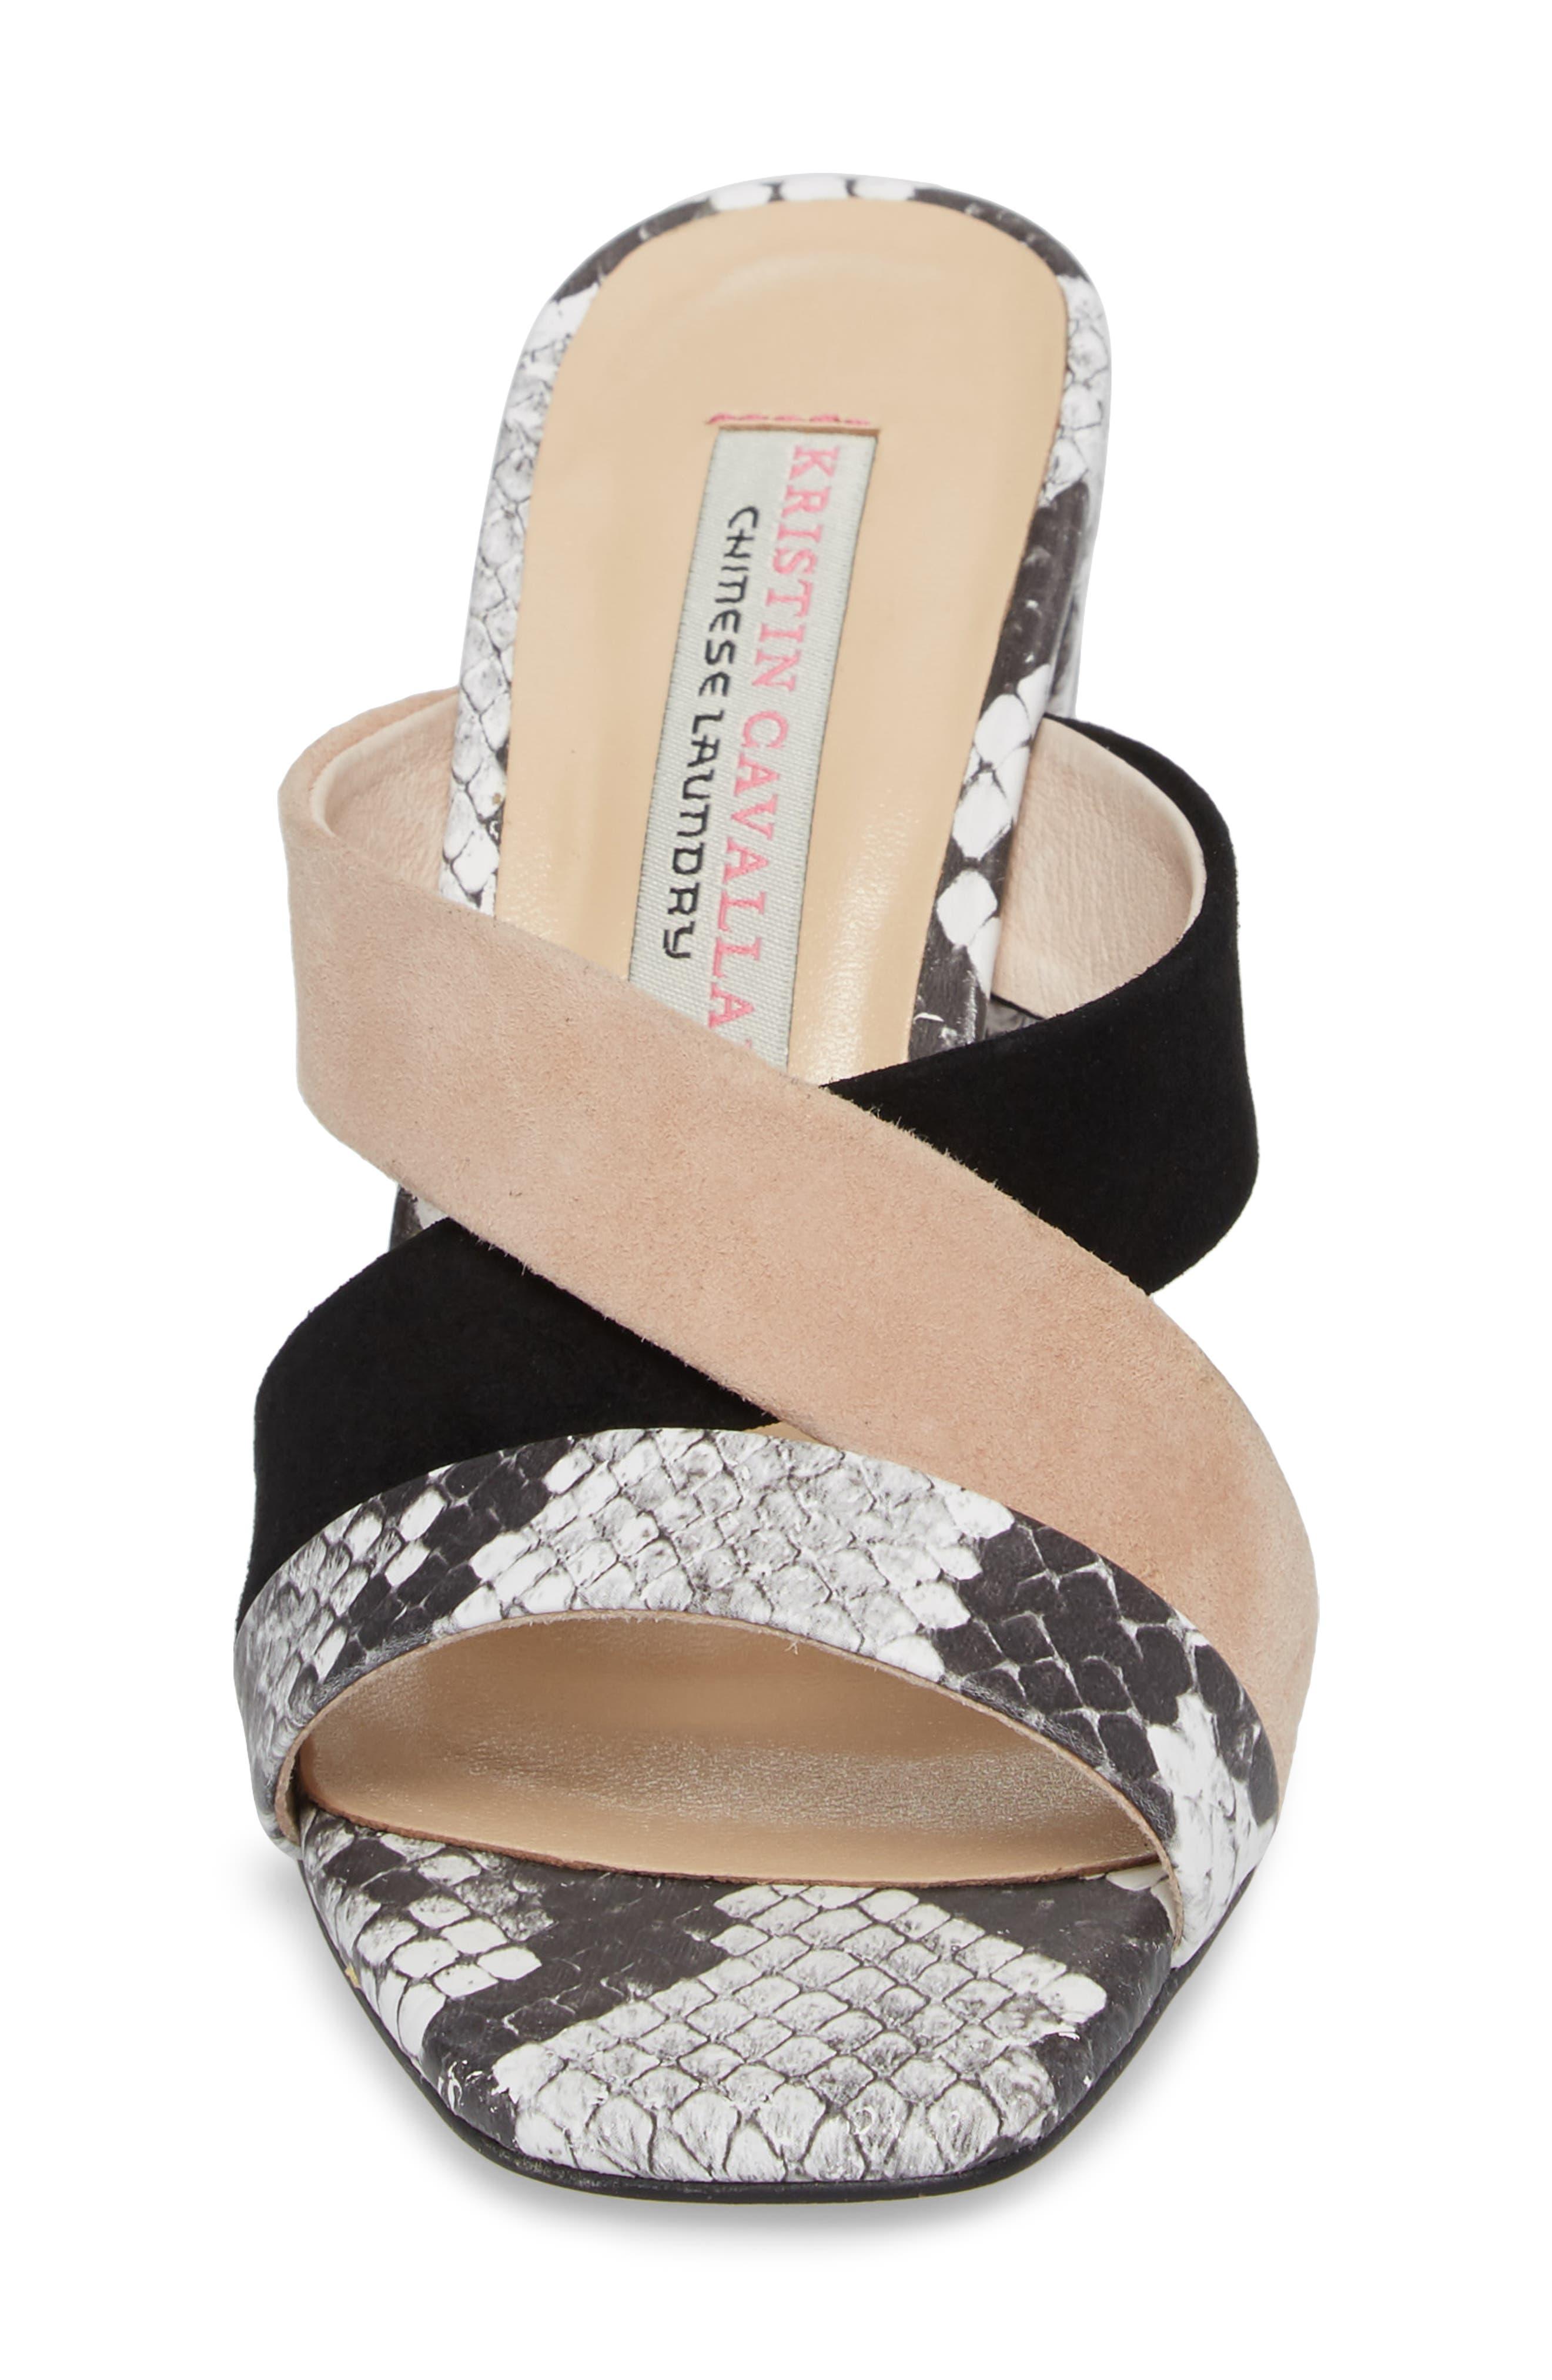 Lola Slide Sandal,                             Alternate thumbnail 4, color,                             Grey/ White Print Leather